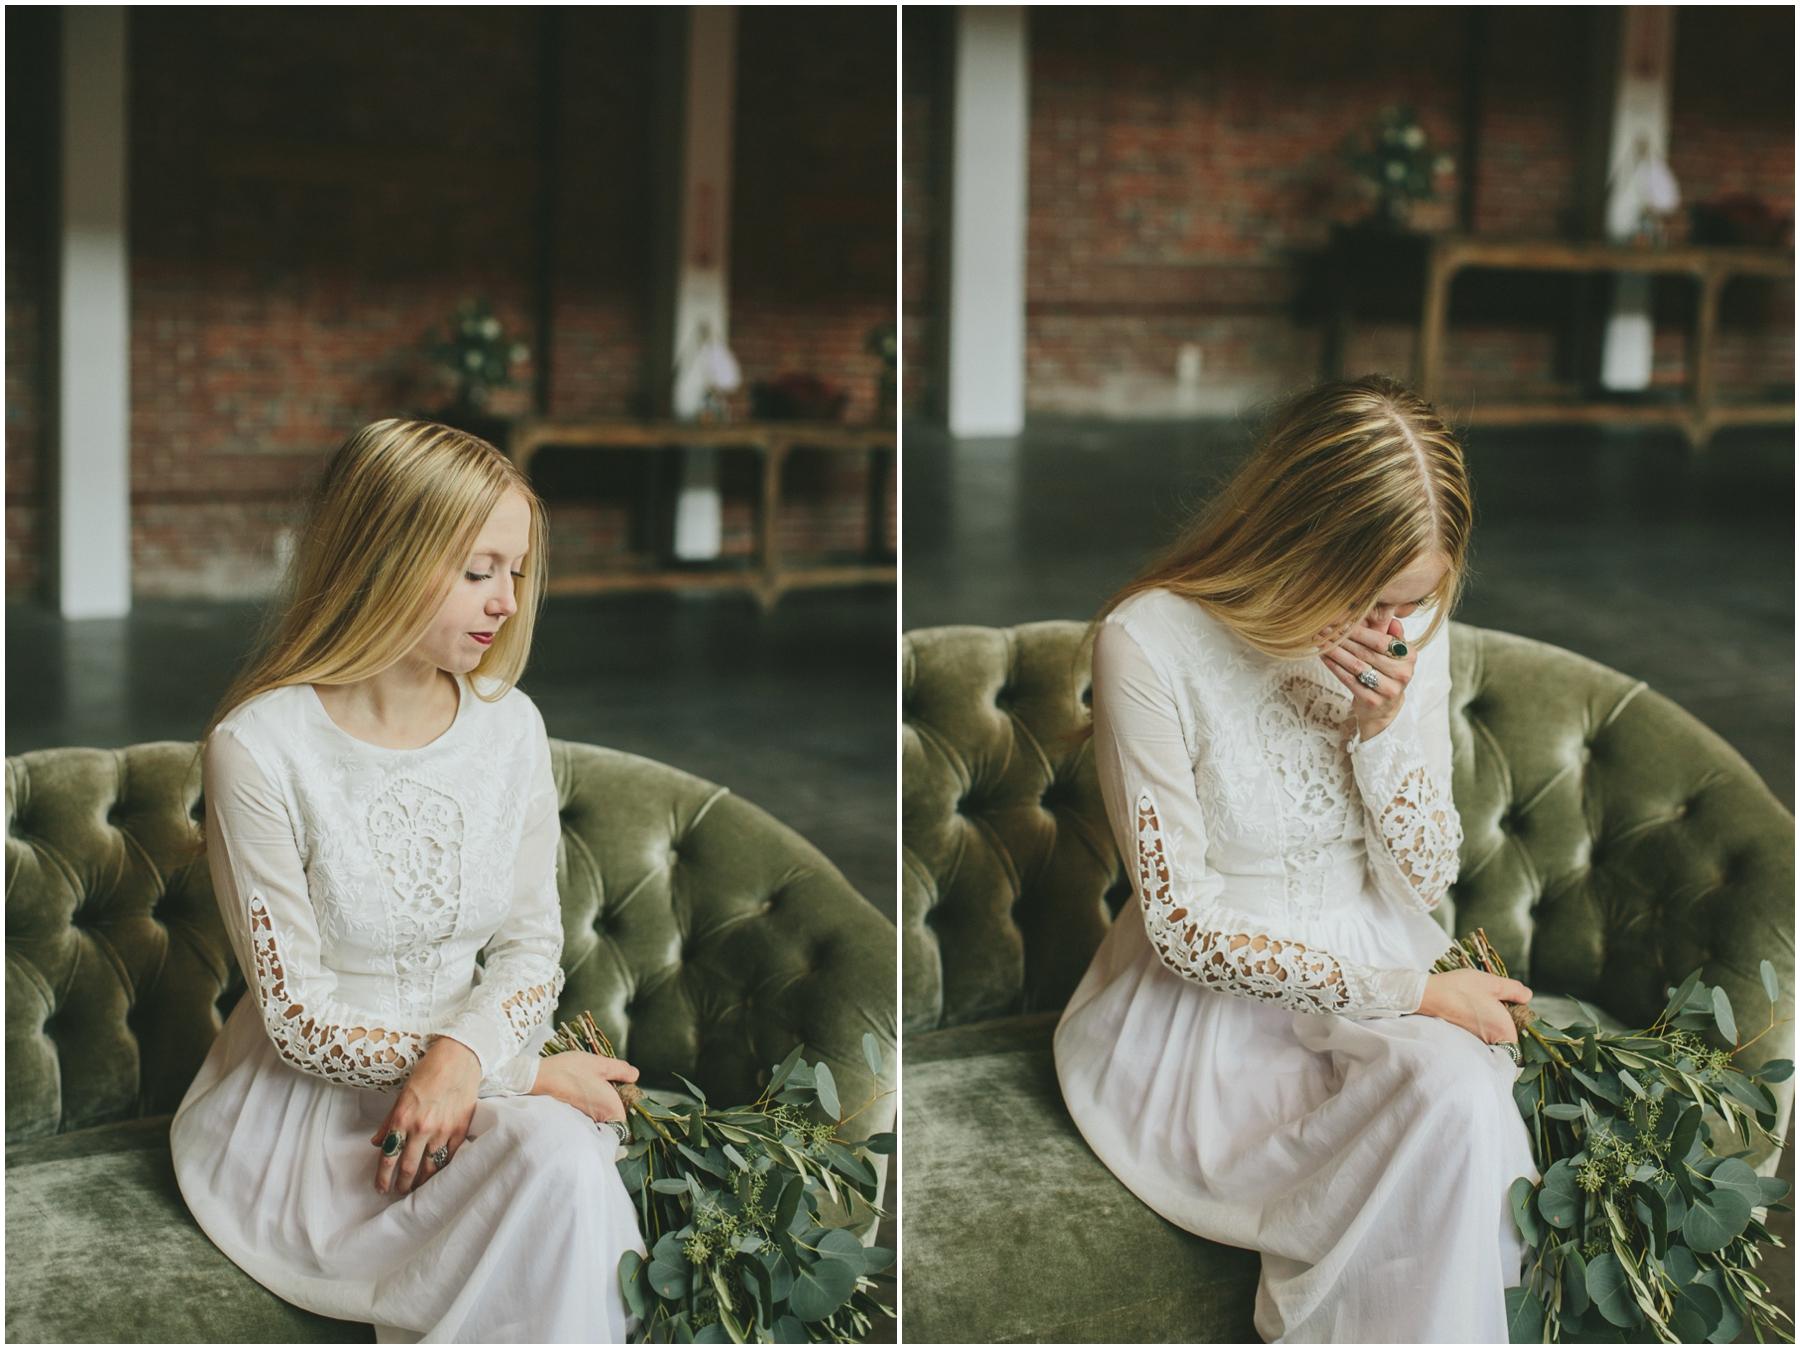 Natalie+Corey-WEDDING_KELLYBOITANO_0051